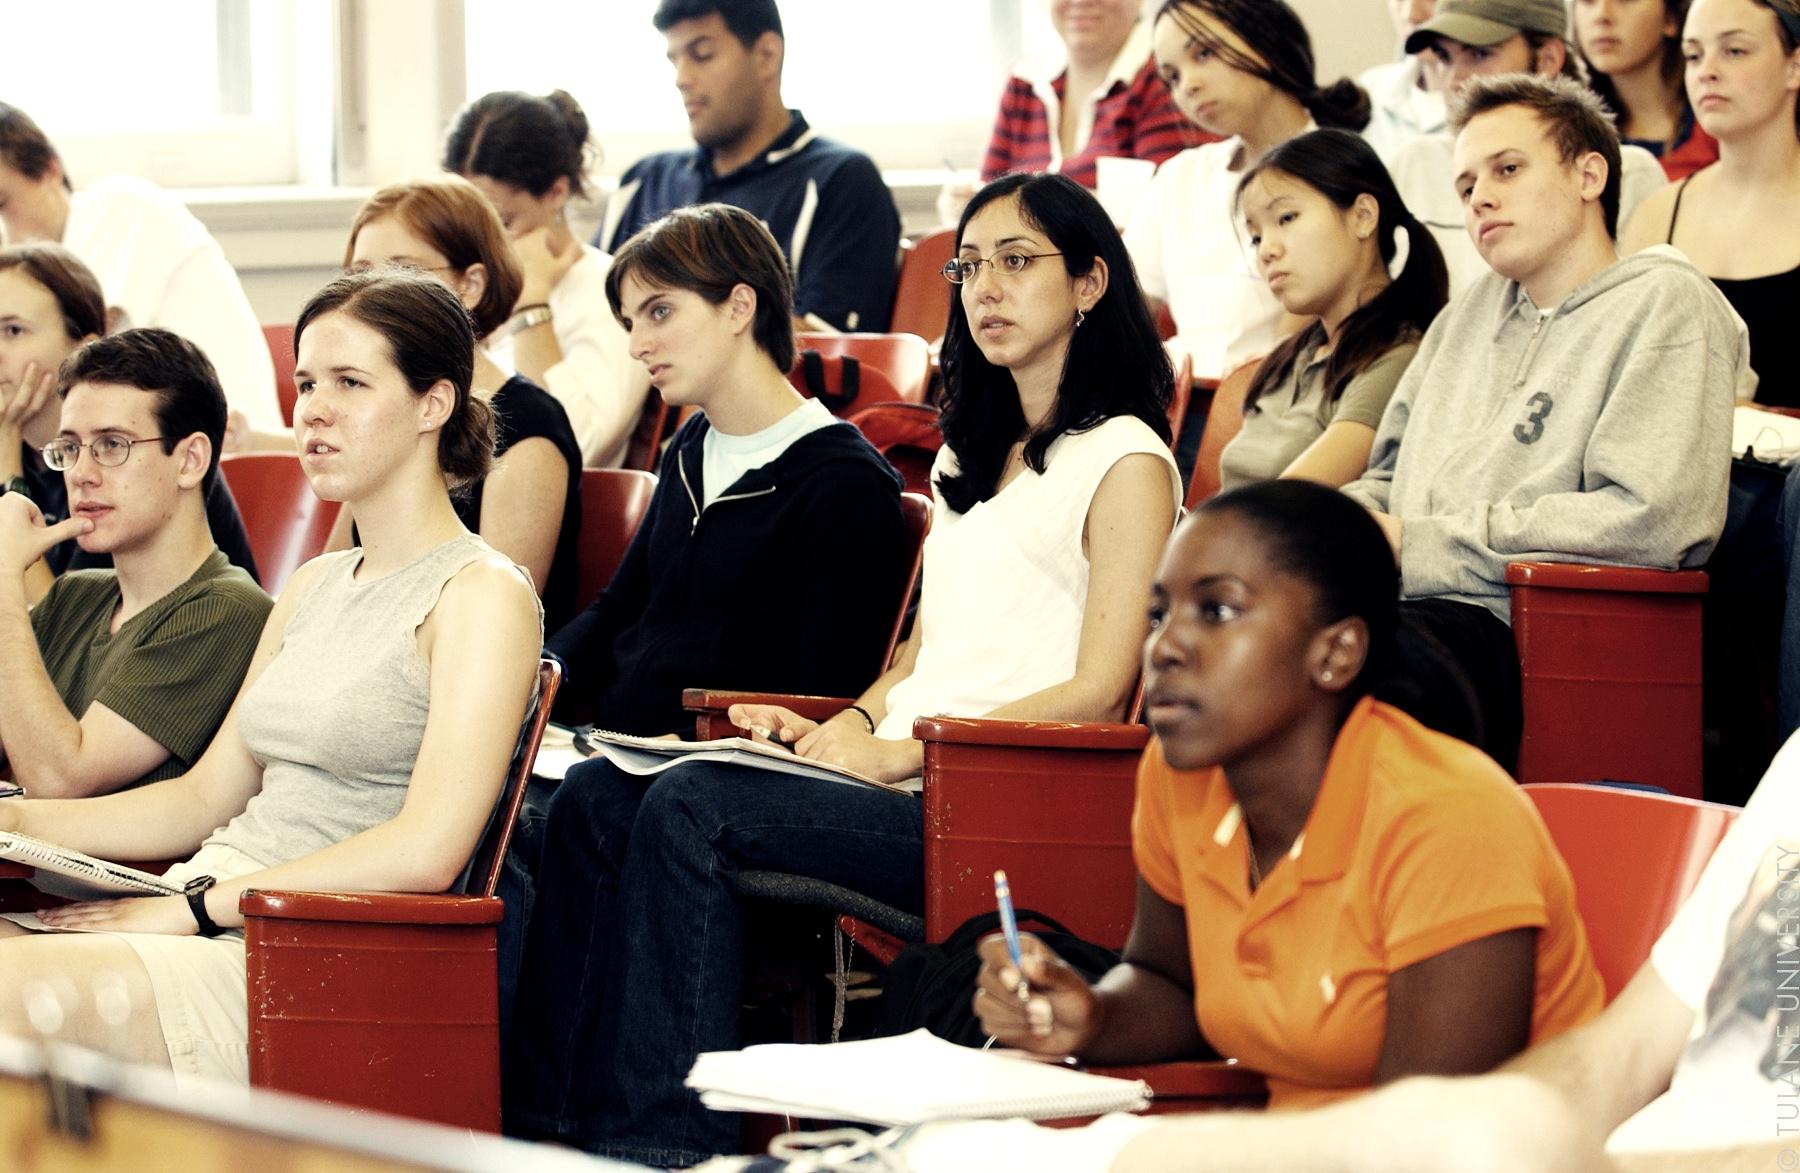 Crispy-Content-Blog-5-Wege-zum-Perfektionieren-der-eigenen-Content-Marketing-Skills-Students-in-Class-by-Tulane-Public-Relations-CC-BY-NC-2.0